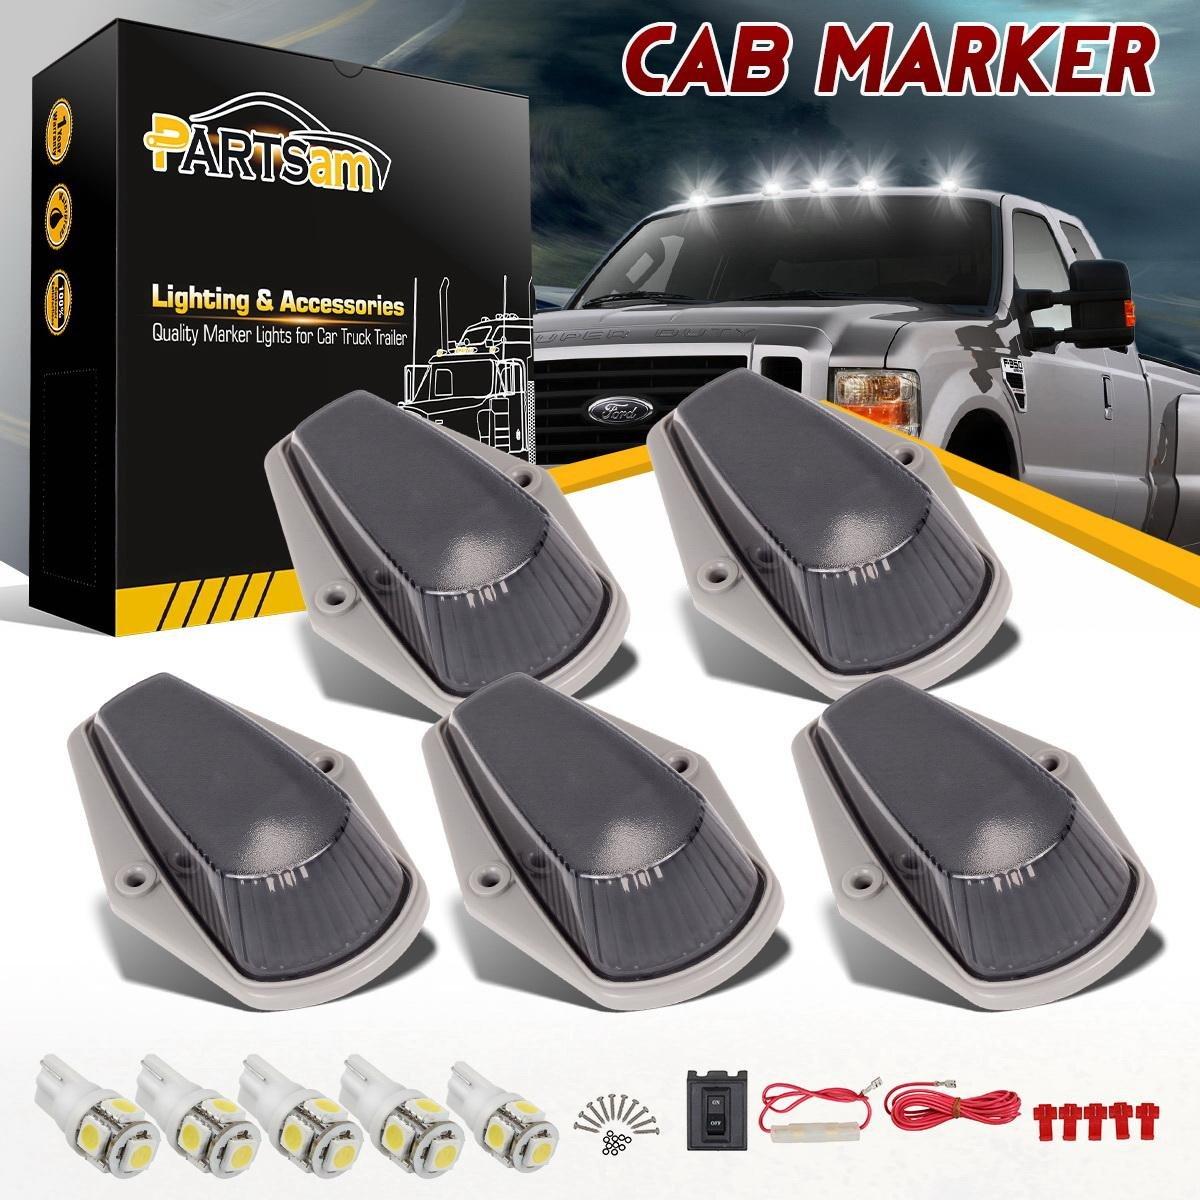 Partsam 5PCS Cab Marker Light 12LED Amber Roof Running Top ... on